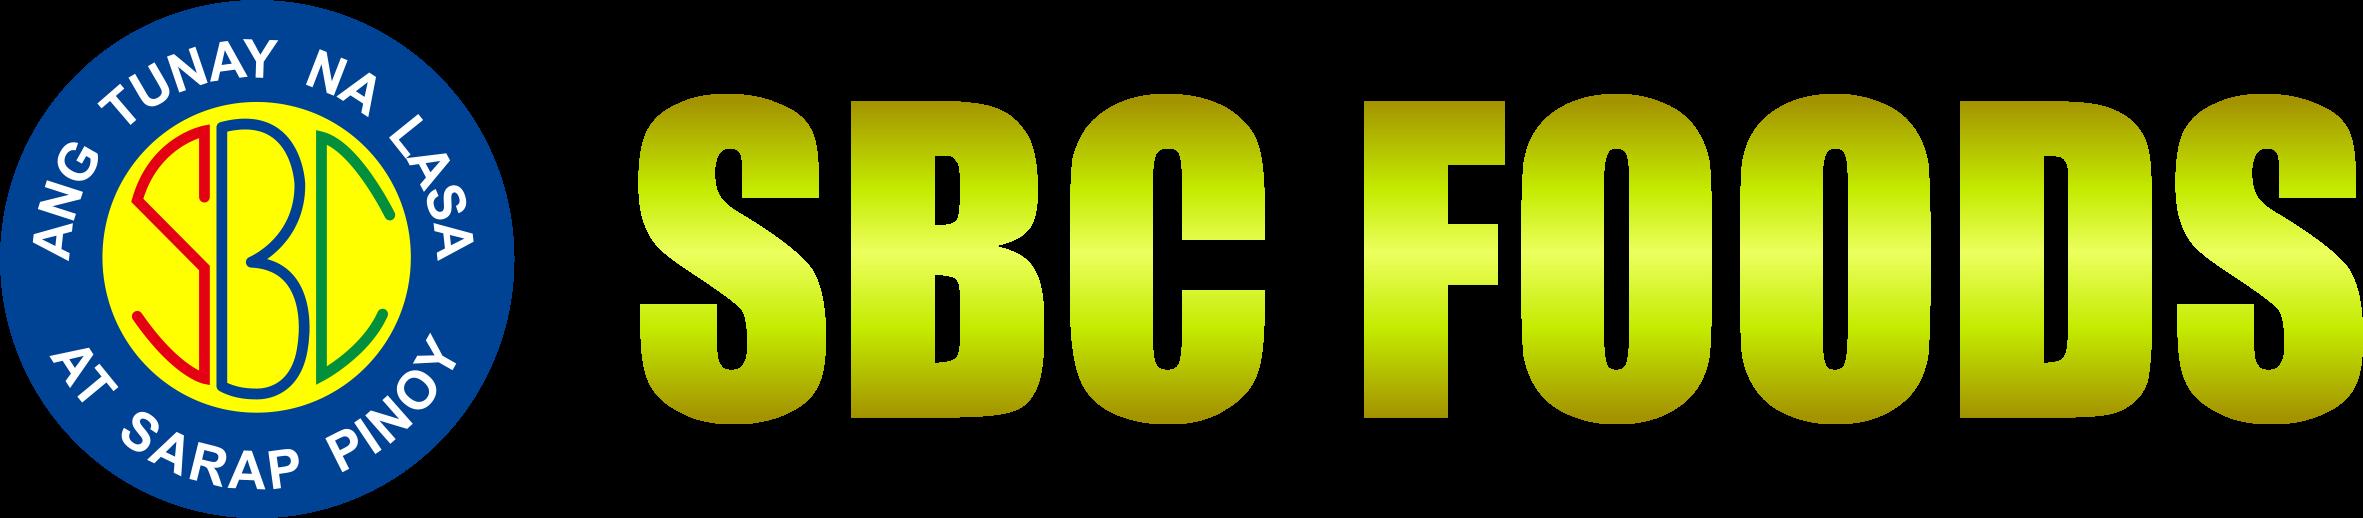 SBC Pinoy Online